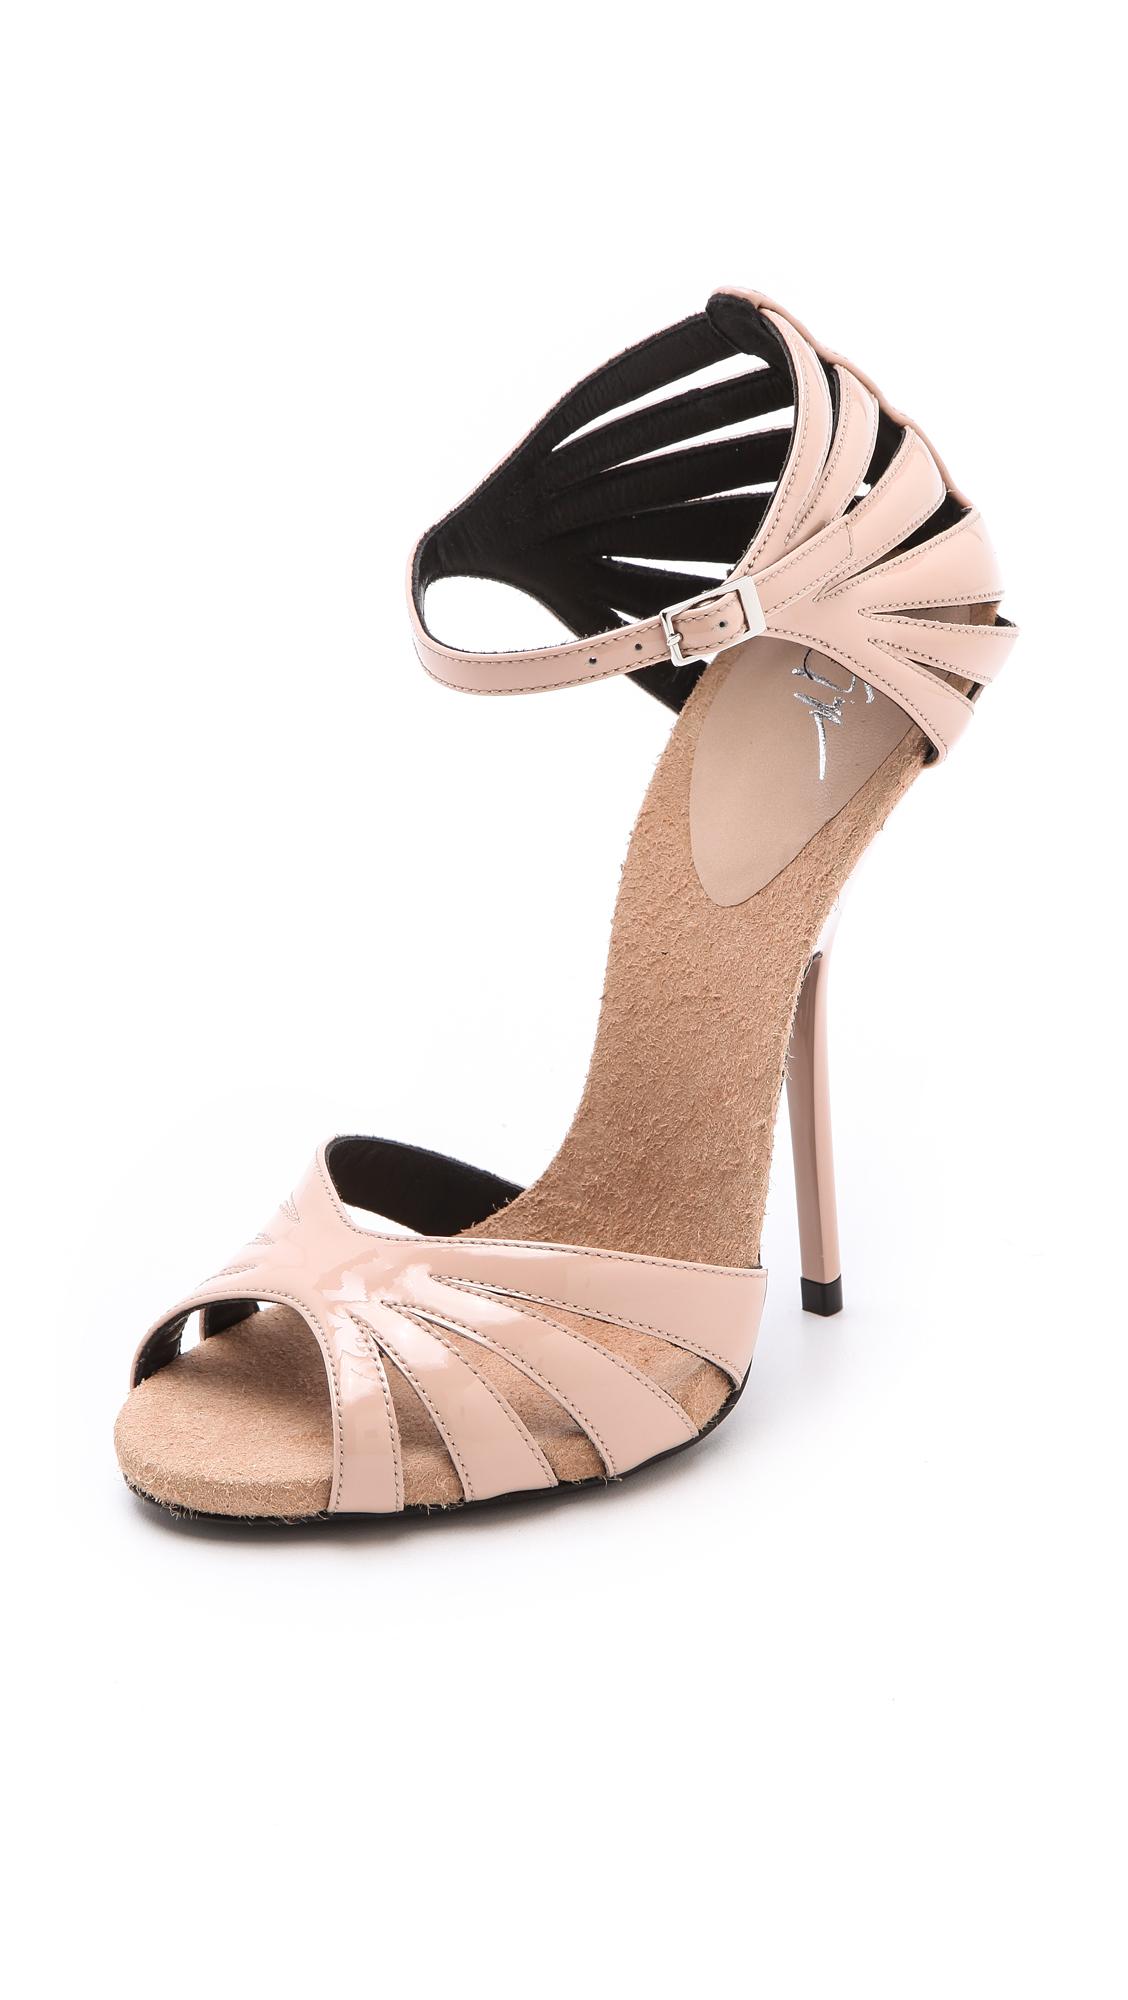 03cdd2d3ba83c6 Shoeniverse  GIUSEPPE ZANOTTI Pink Alien Patent Sandals